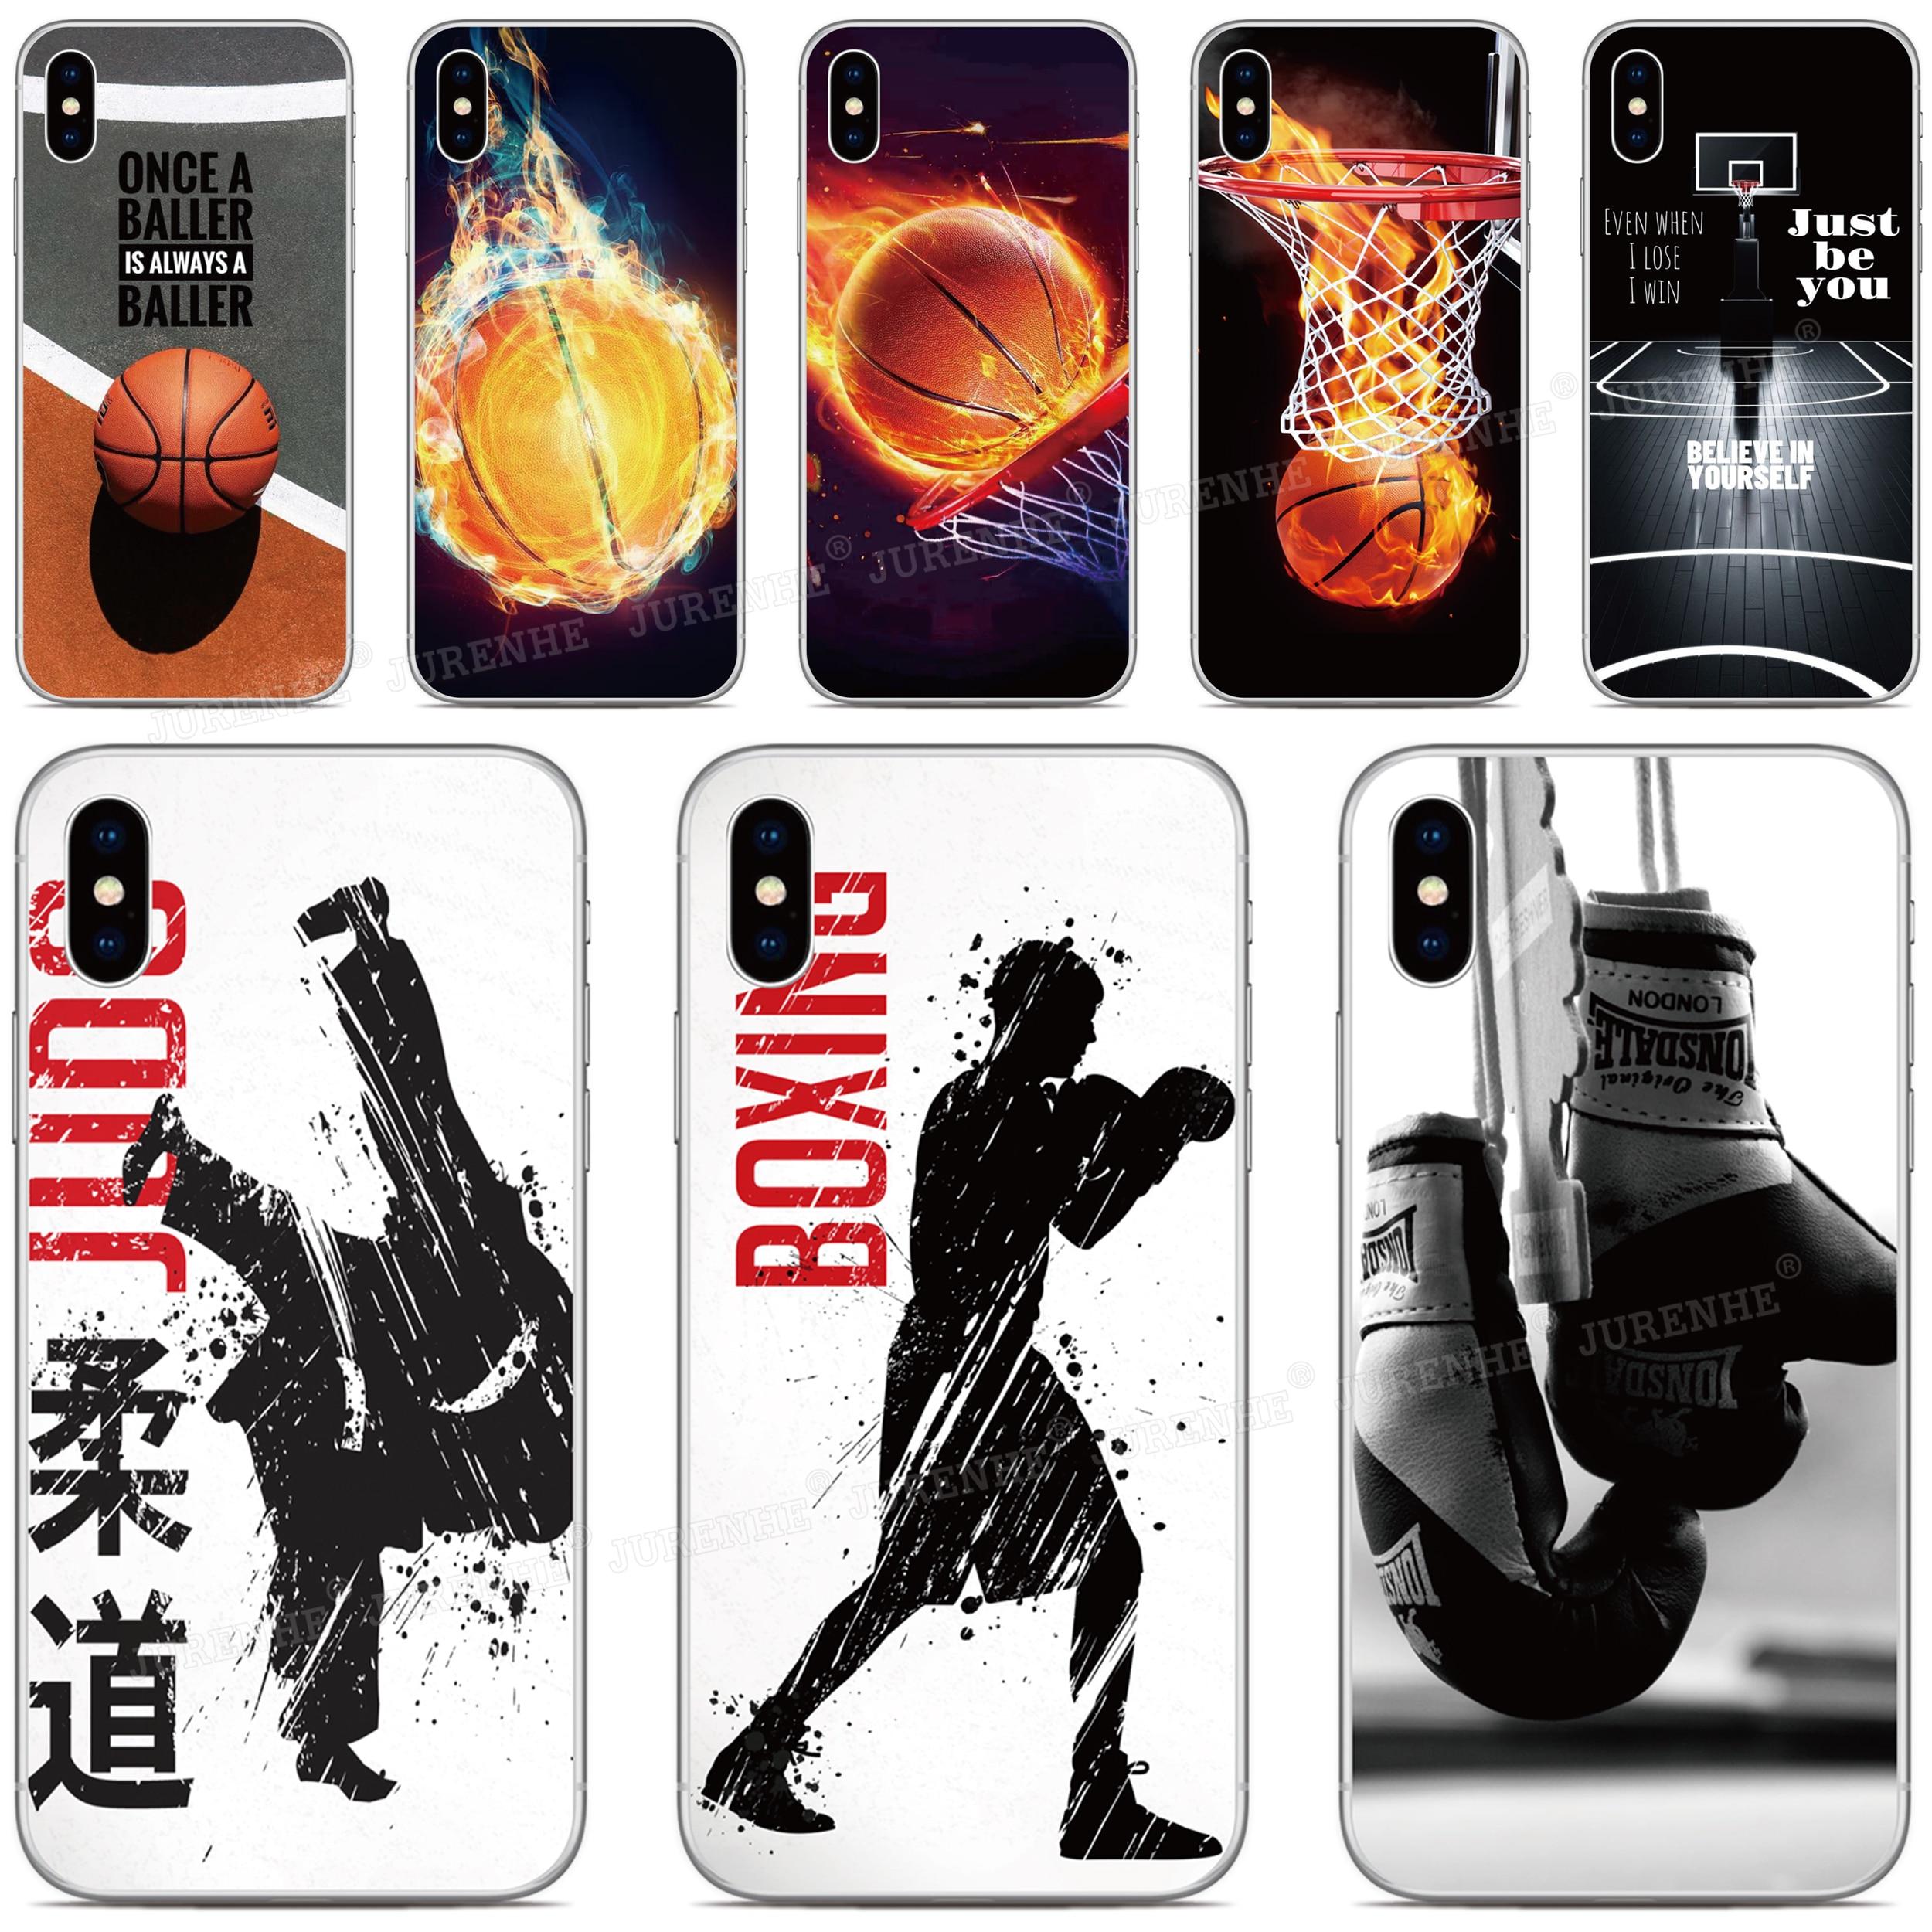 Basquete Esporte de Silicone macio Capa Para Doogee X90 X95 N20 Y9 Plus N10 Y7 Y8 Y8C X70 X60 X60L X50 X50L X30 2 X55 Mix Caso de Telefone